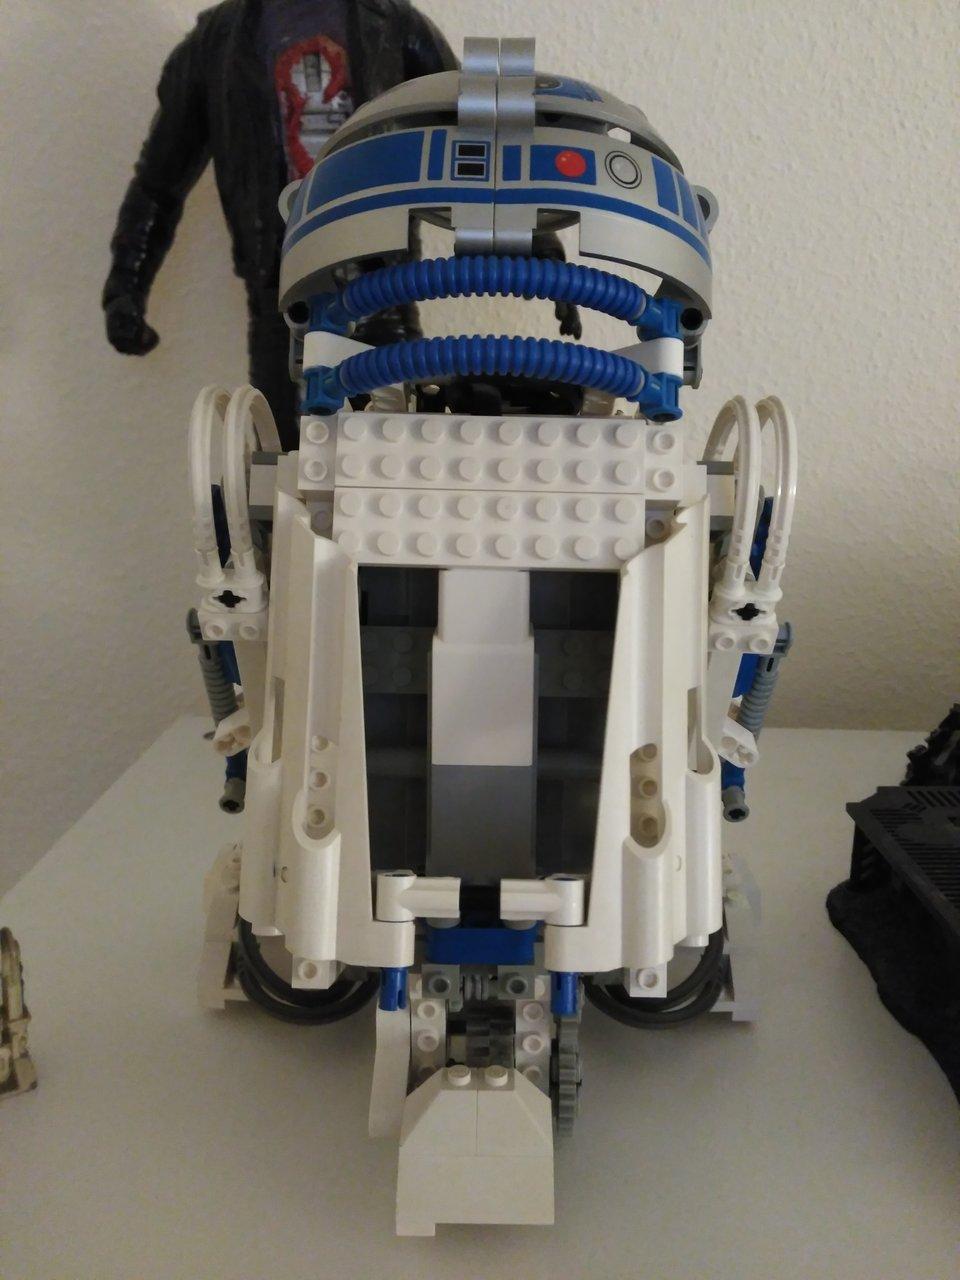 LEGO EV3 R2-D2 photo